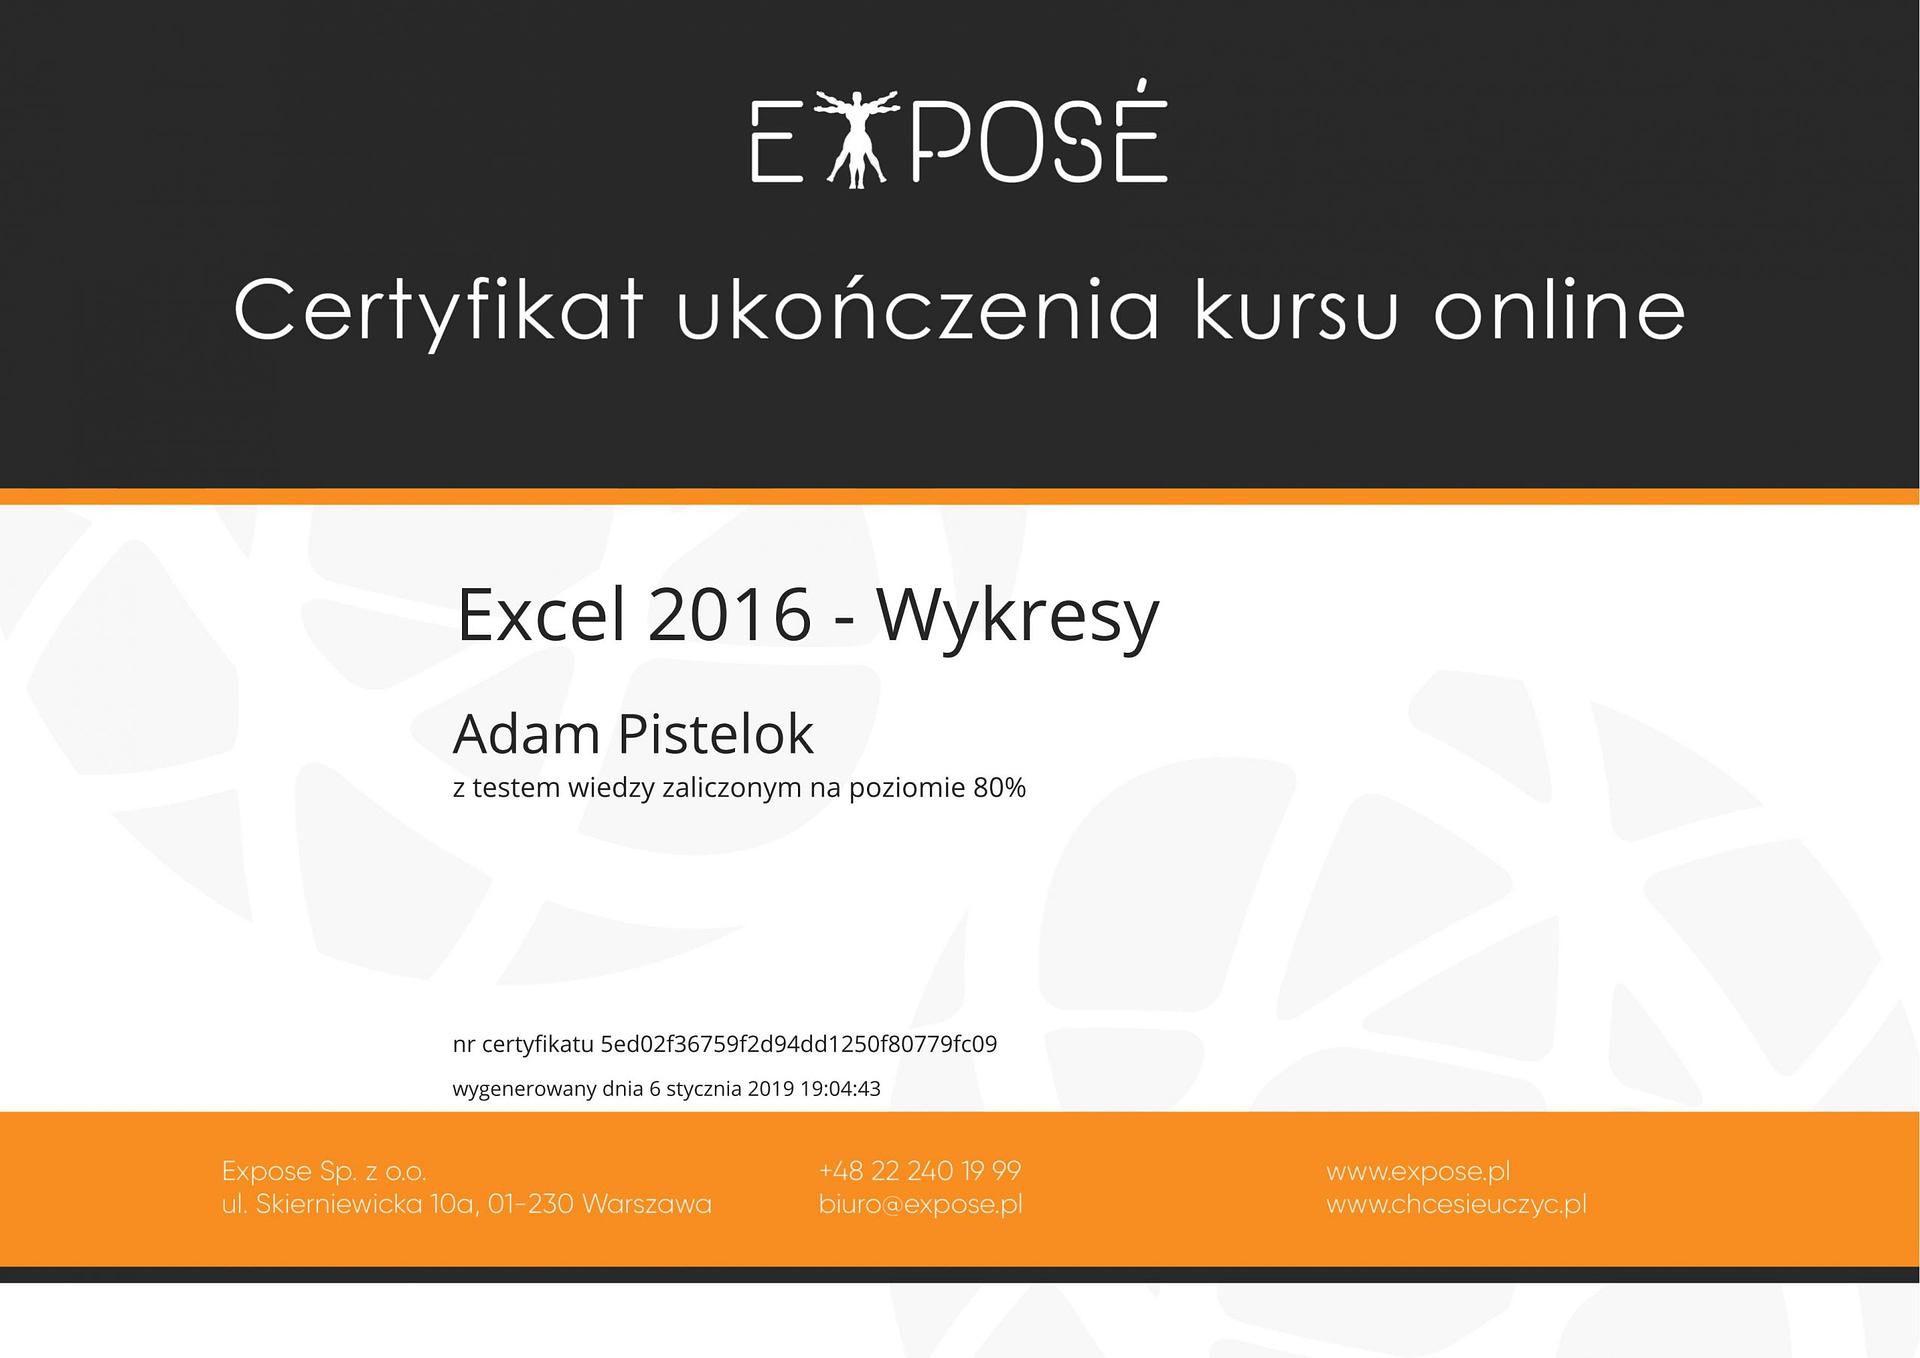 Excel 2016 wykresy